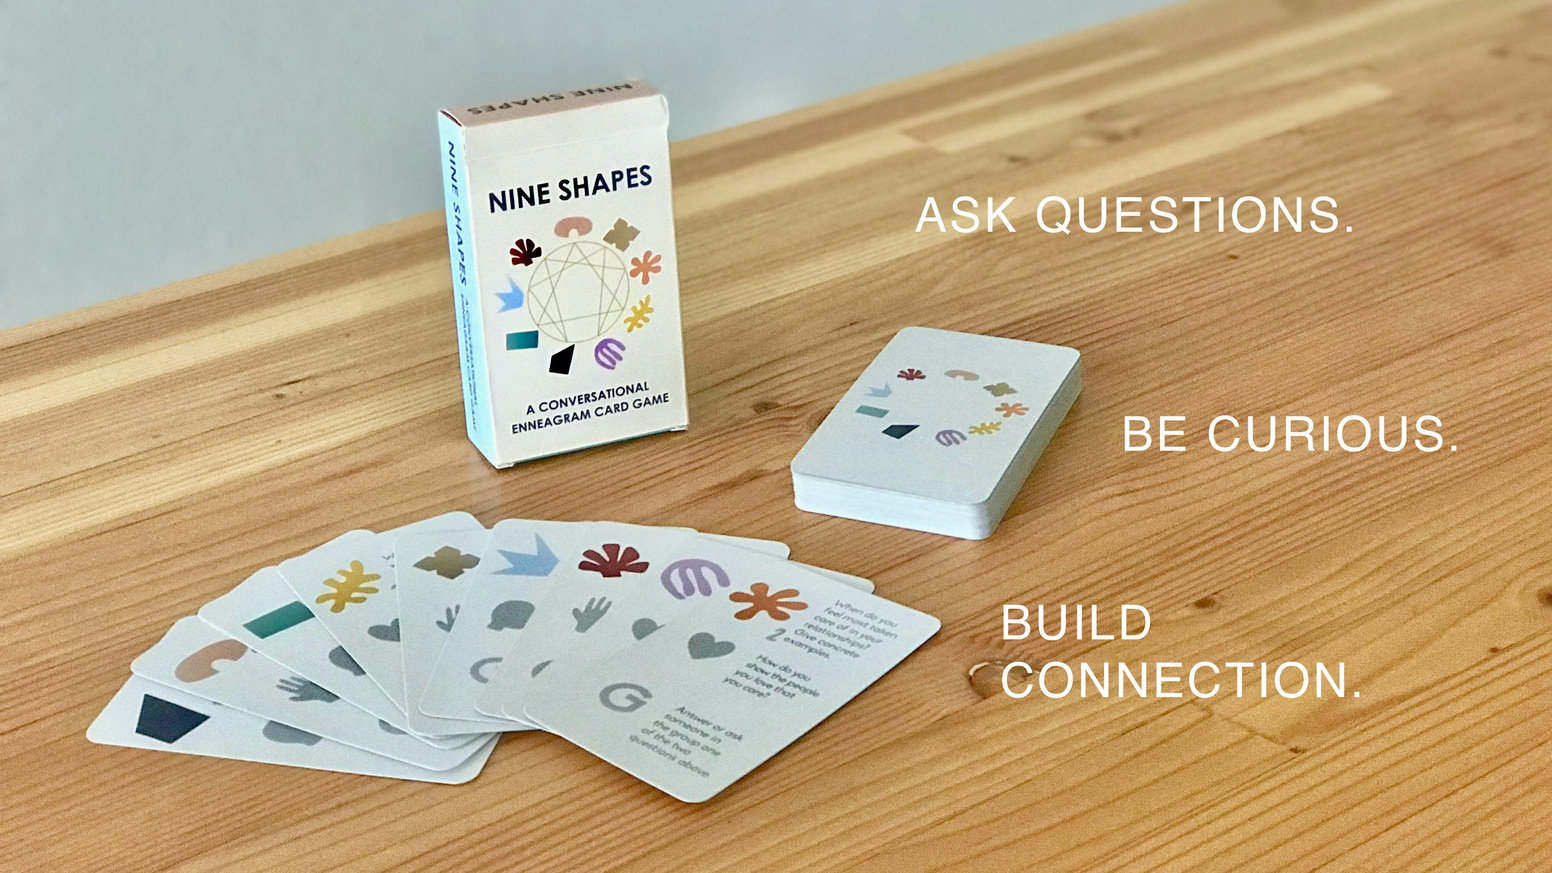 Conversational Cards Around the Enneagram